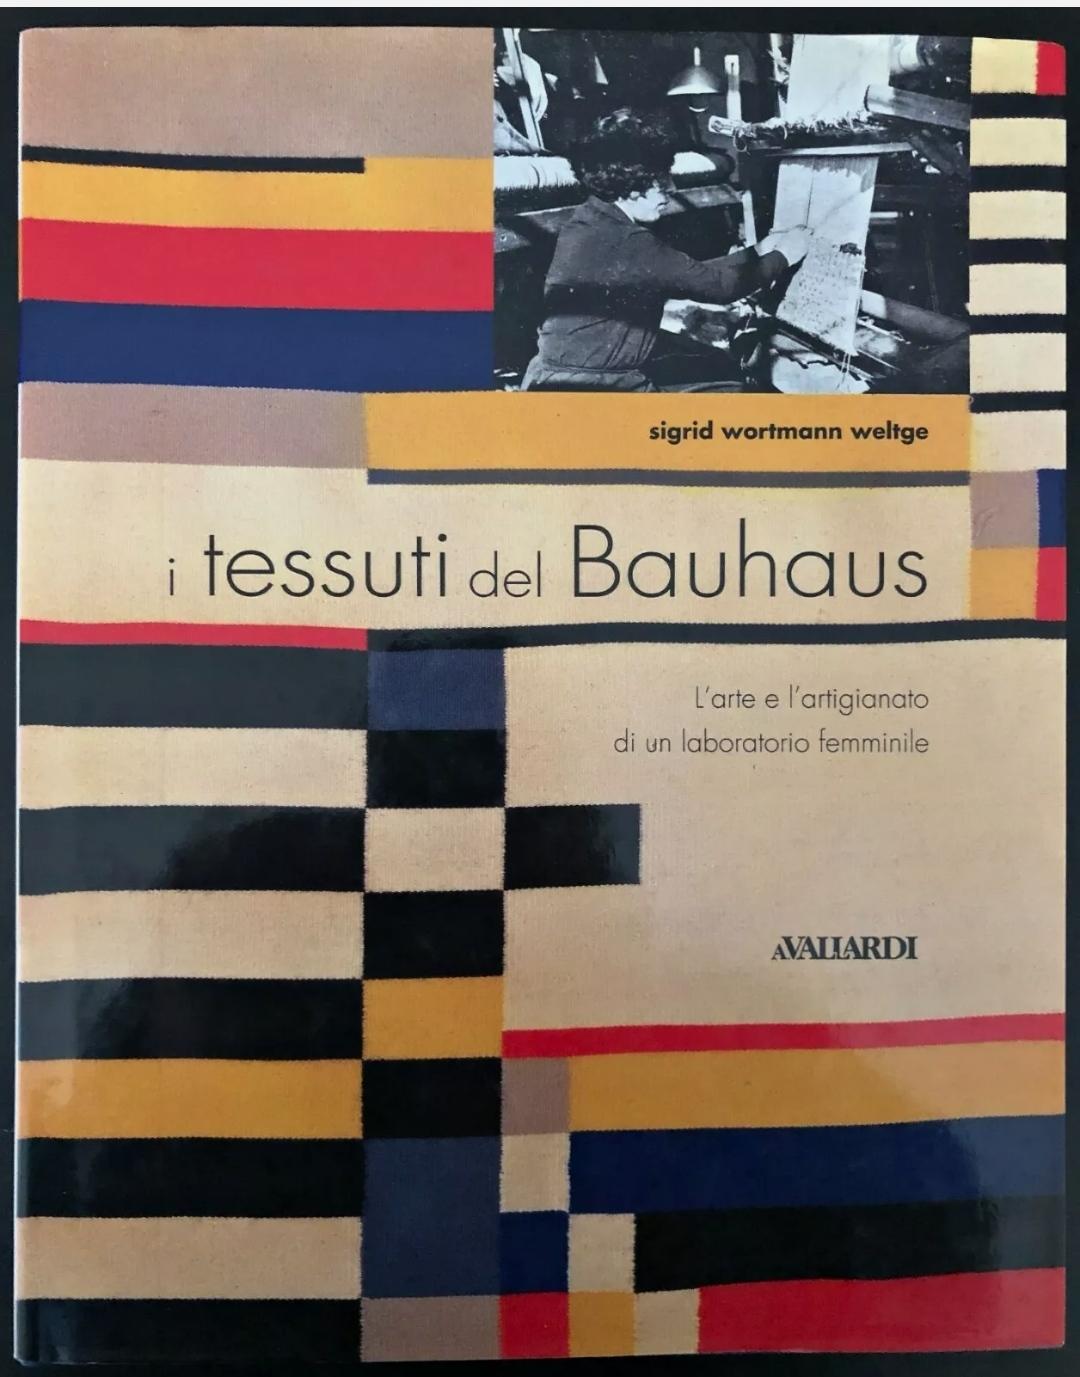 I TESSUTI DEL BAUHAUS…BY Wortmann Weltge Sigrid. Prima ediz. Libro introvabile